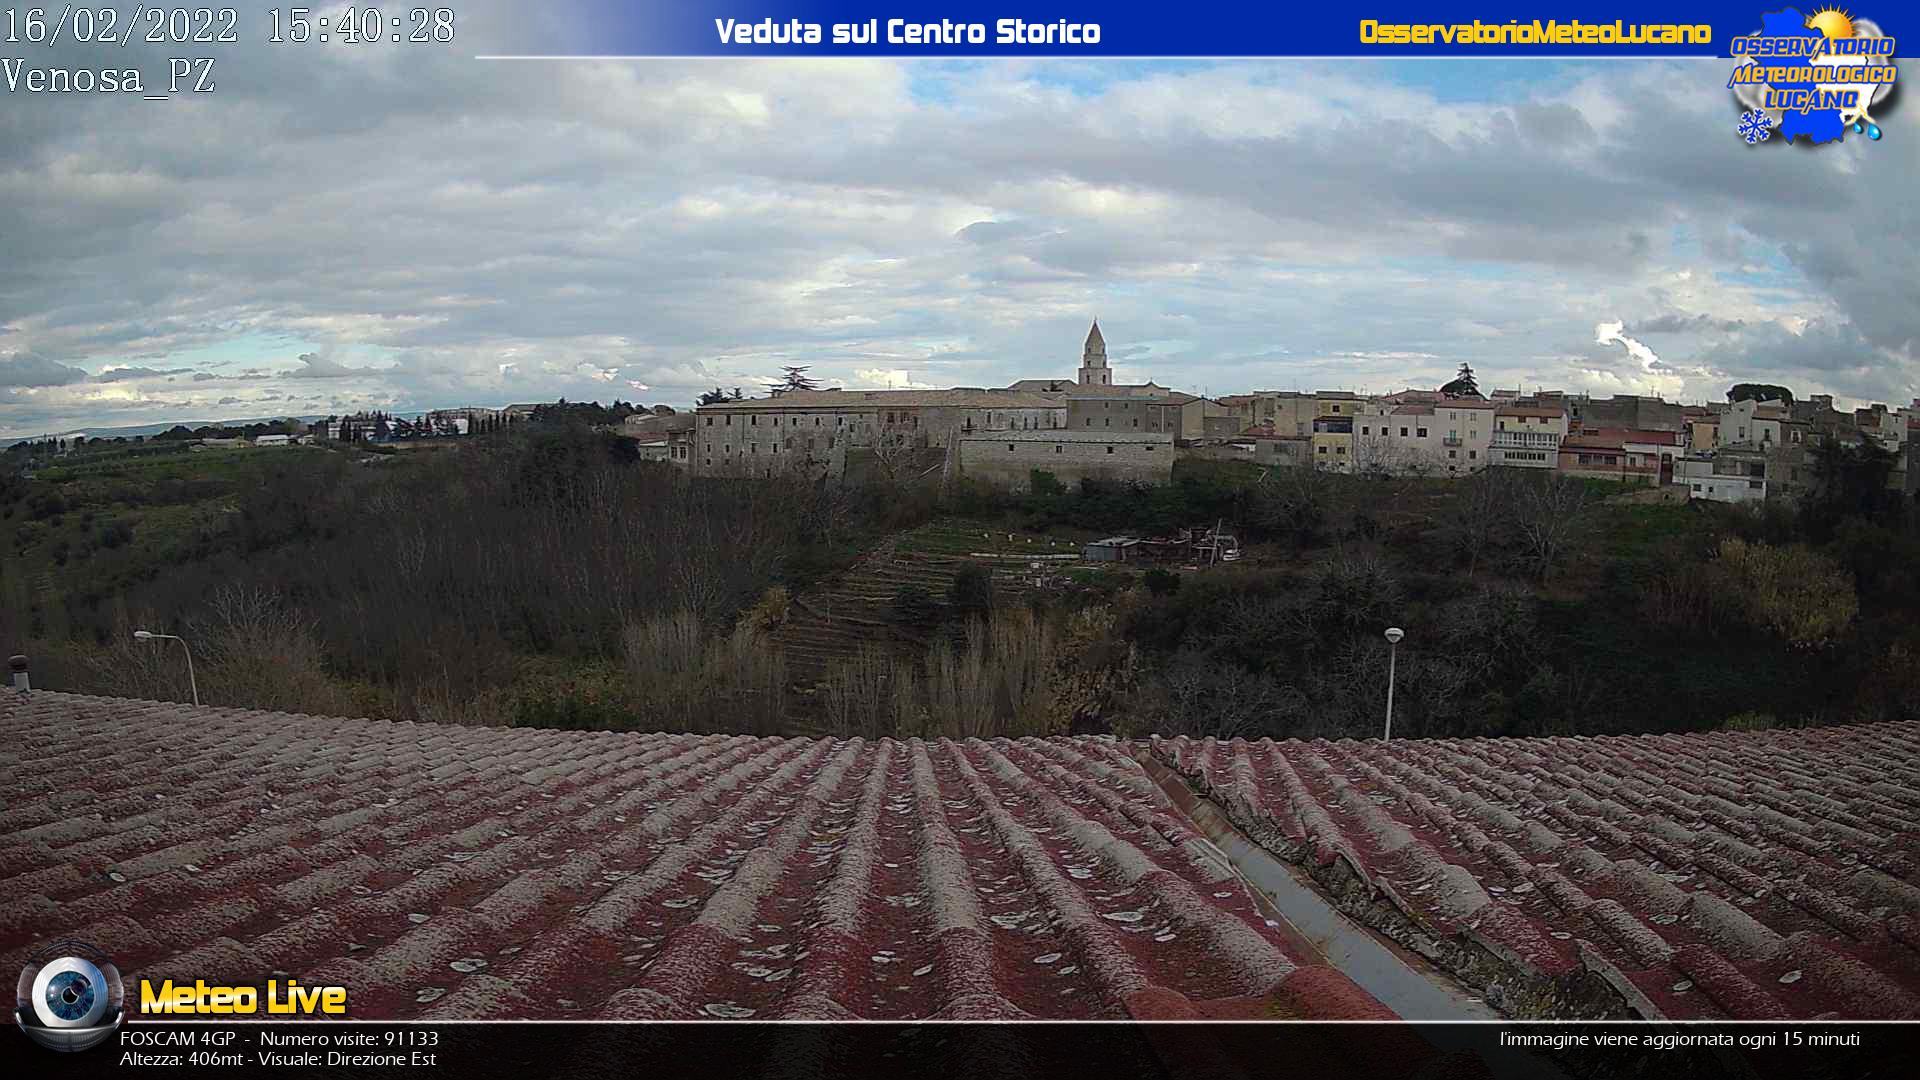 http://osservatoriometeolucano.altervista.org/webcam/venosa/FoscamCamera_00626EEE3FC2/snap/webcam.php